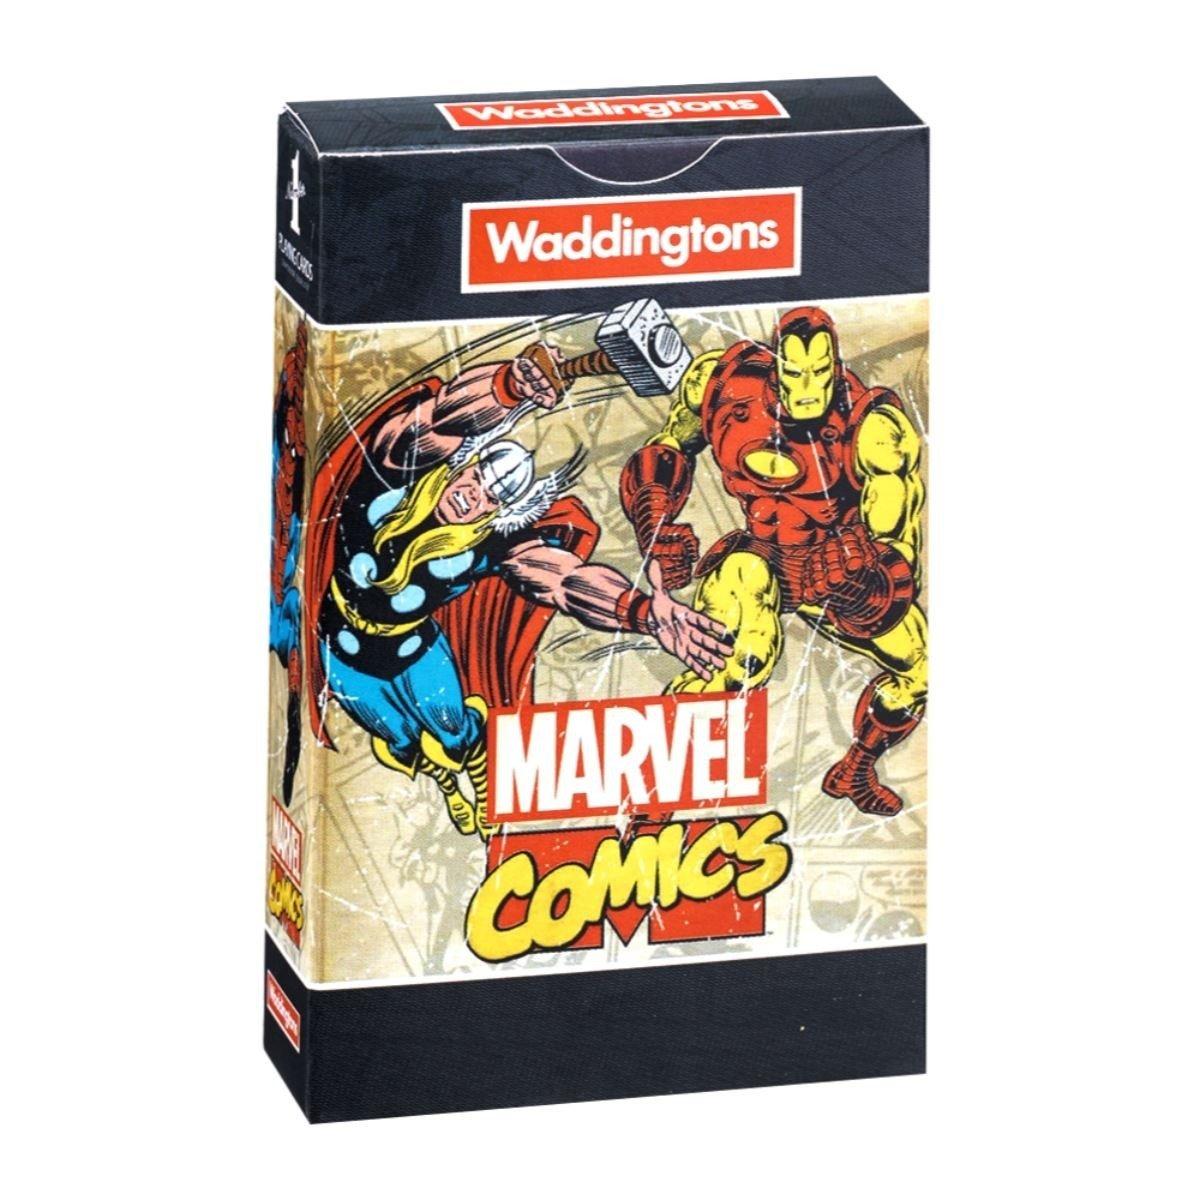 Karty do gry Waddingtons Marvel Comics Retro wersja ...